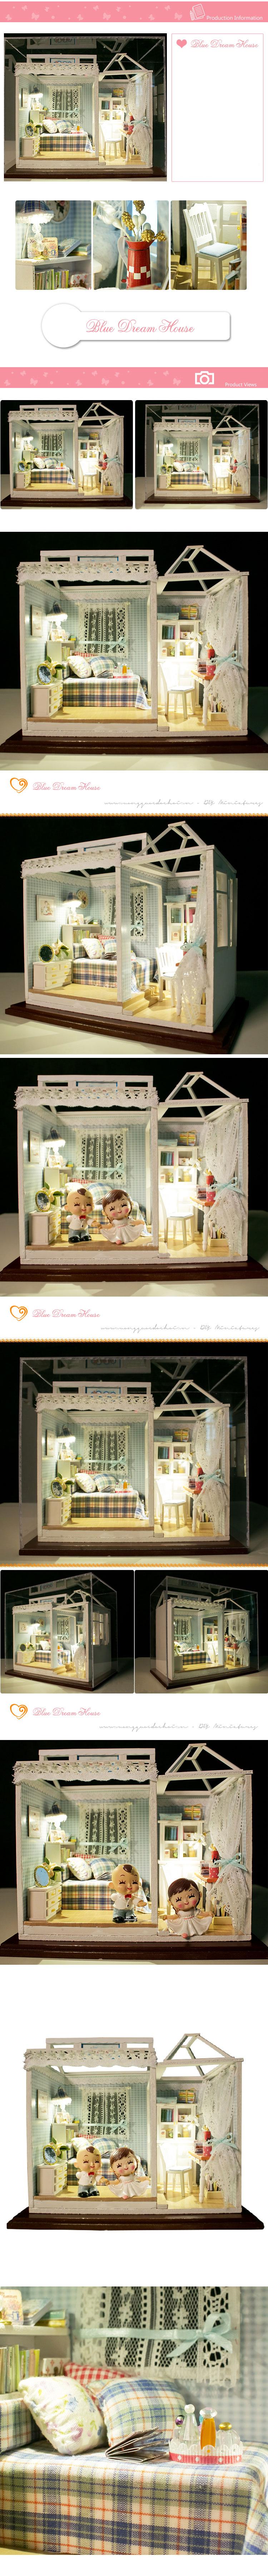 diy miniaturehouse cosyhomee